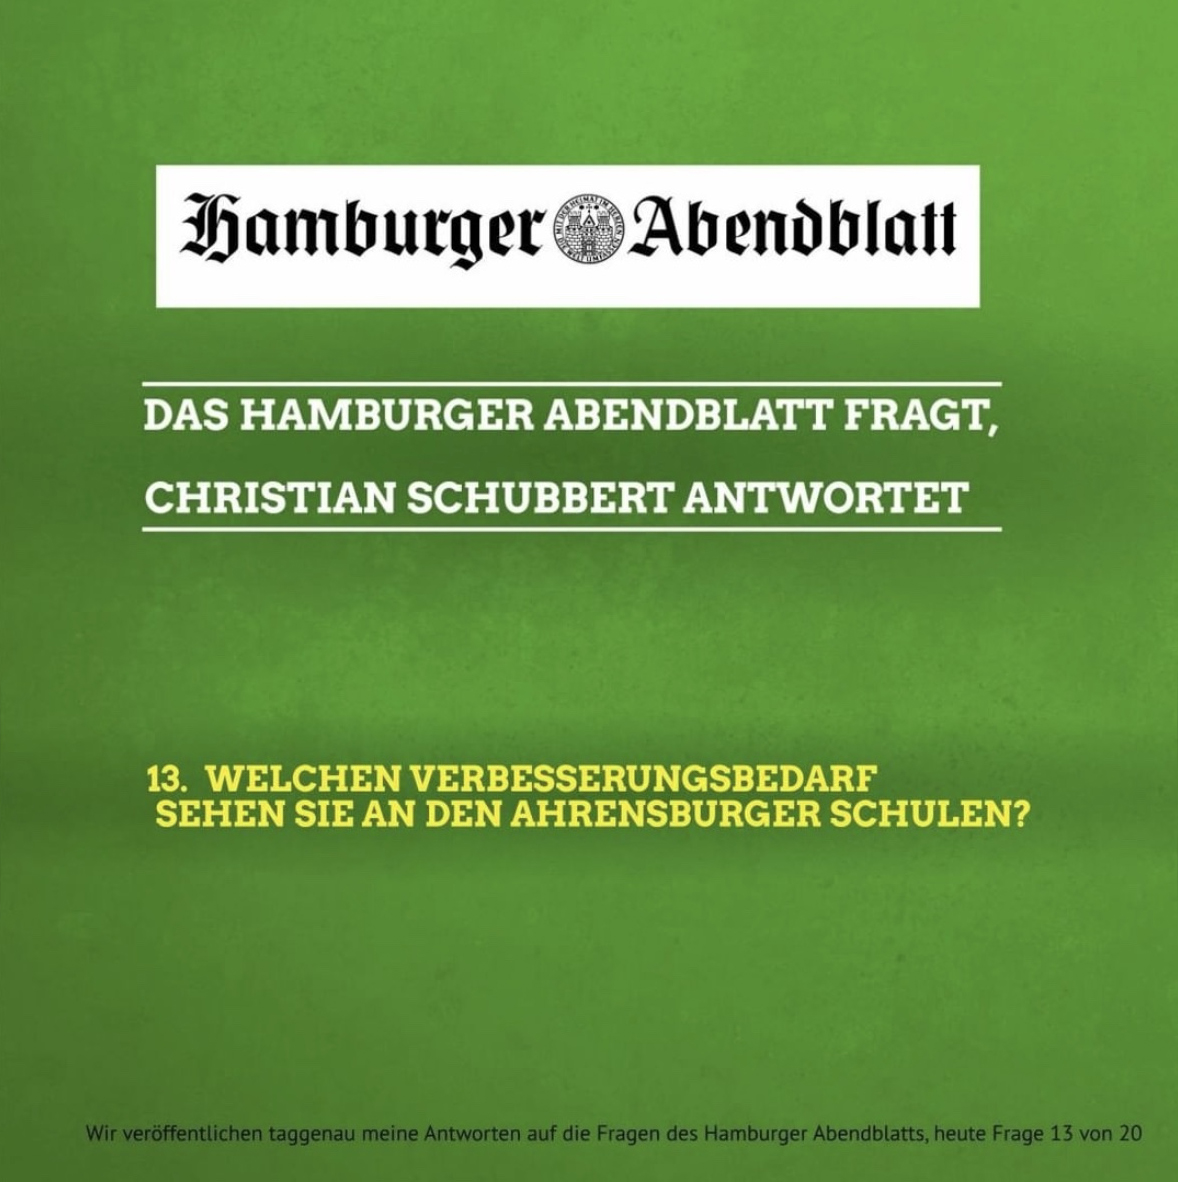 Das Hamburger Abendblatt fragt, Christian Schubbert antwortet: 13. Welchen Verbesserungsbedarf sehen Sie an den Ahrensburger Schulen?